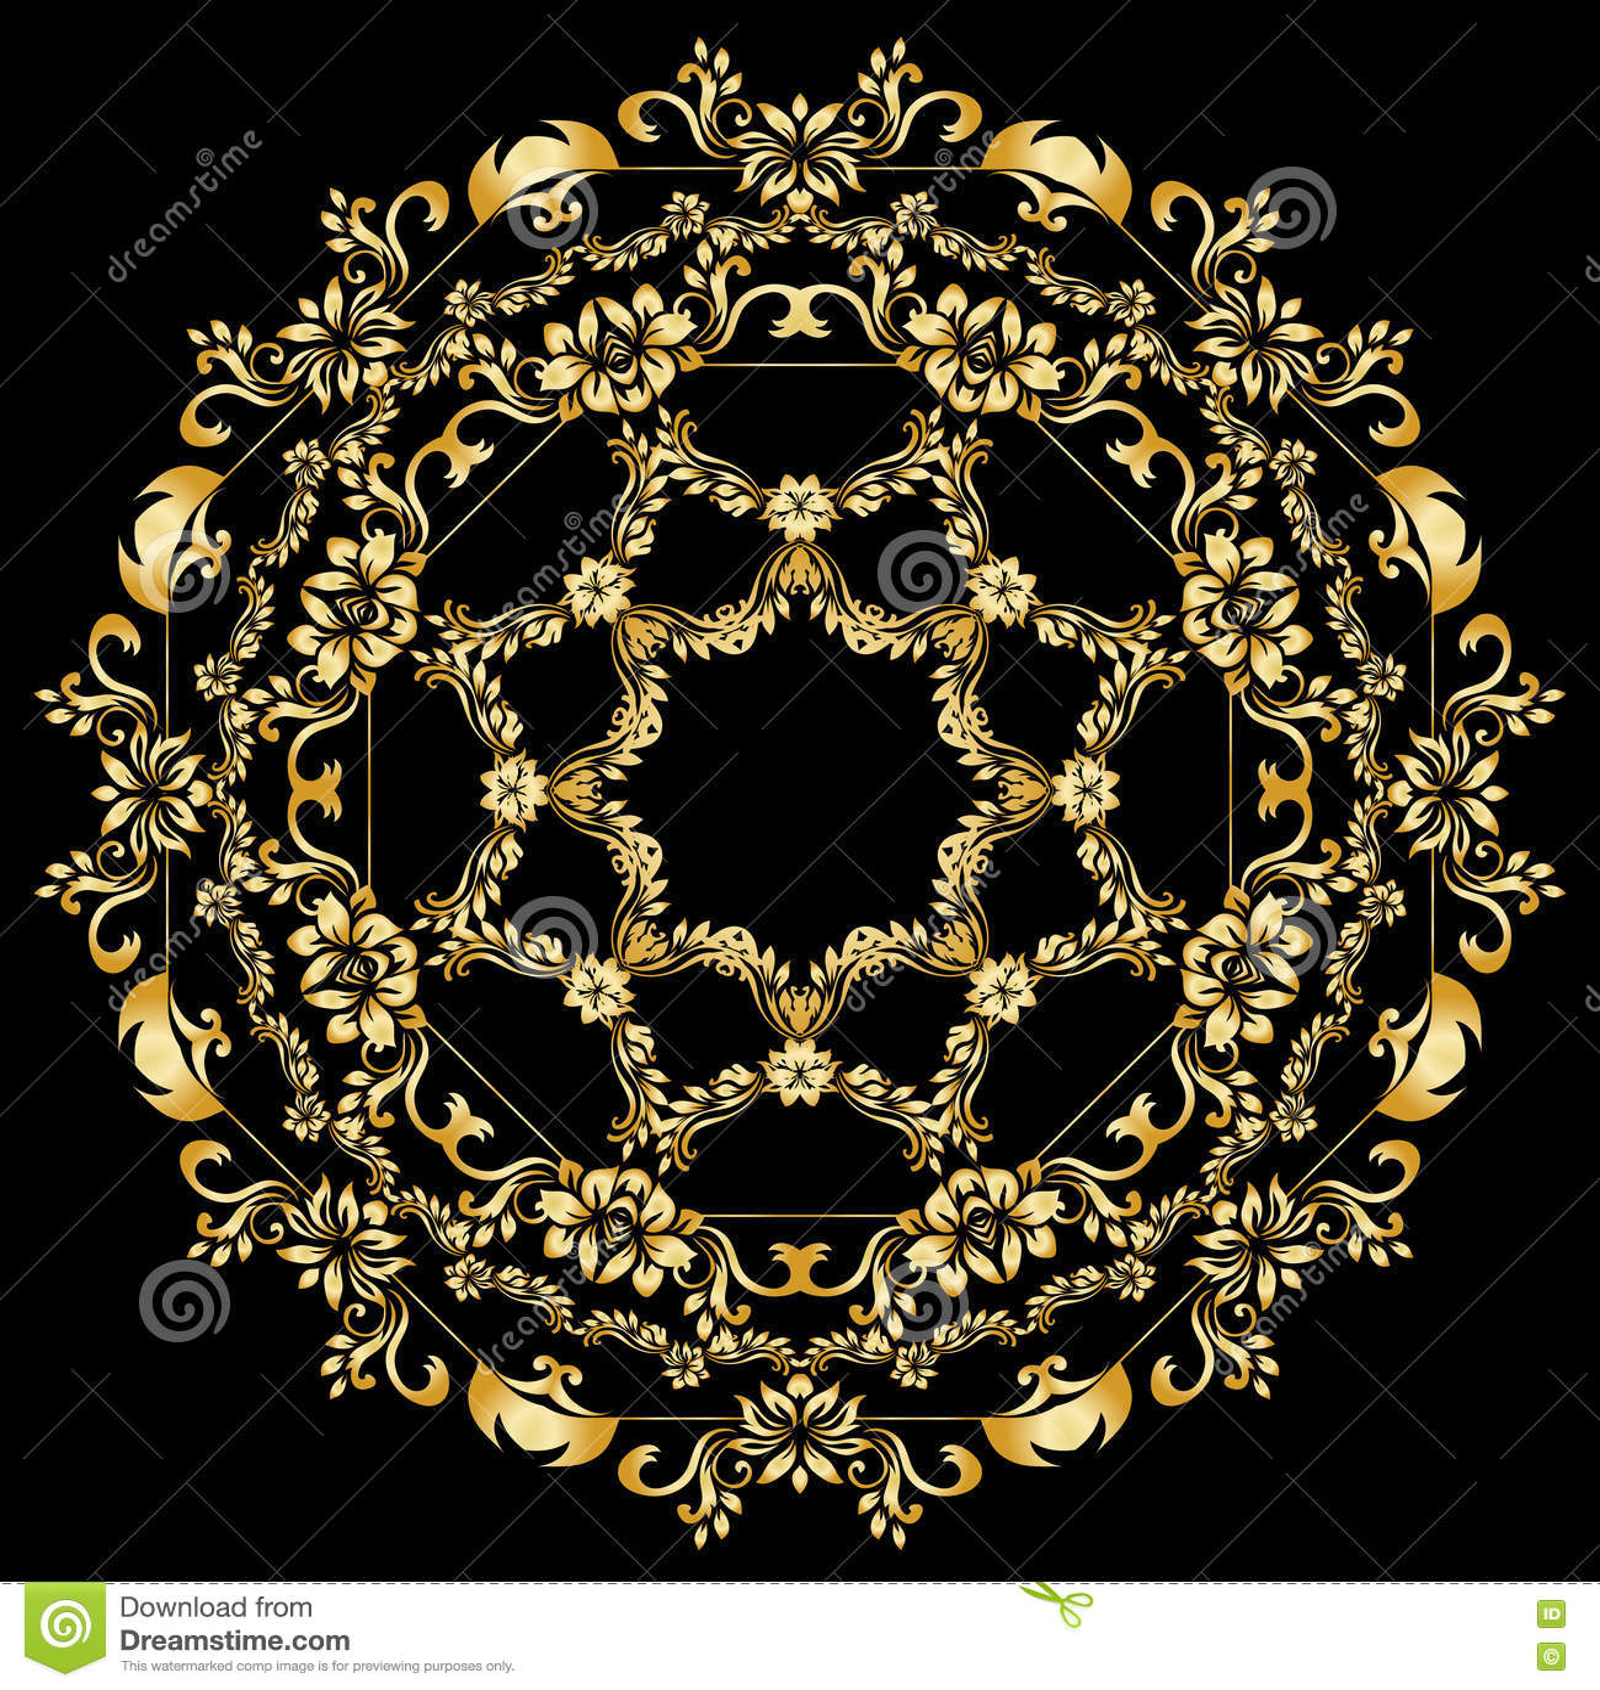 Golden calligraphic vector design elements on the black background. Gold menu and invitation border, round frame,divider